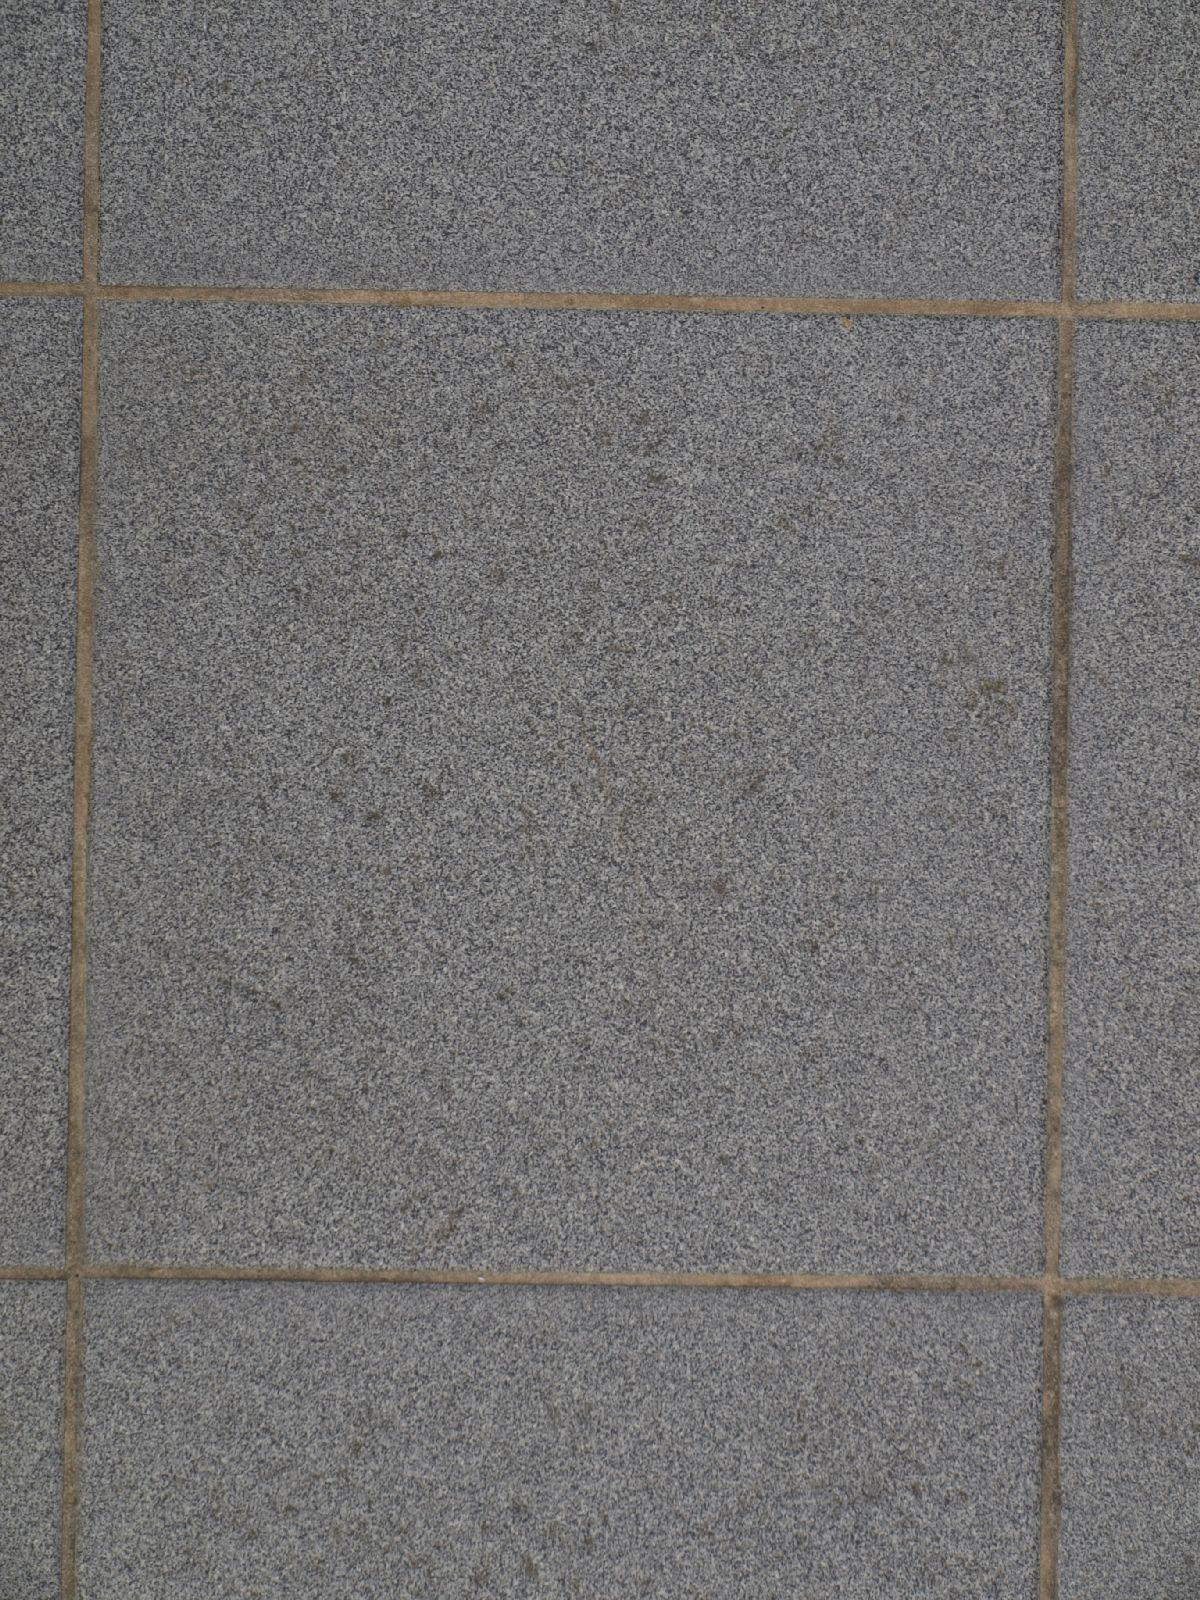 Boden-Gehweg-Strasse-Buergersteig-Textur_A_PA045709